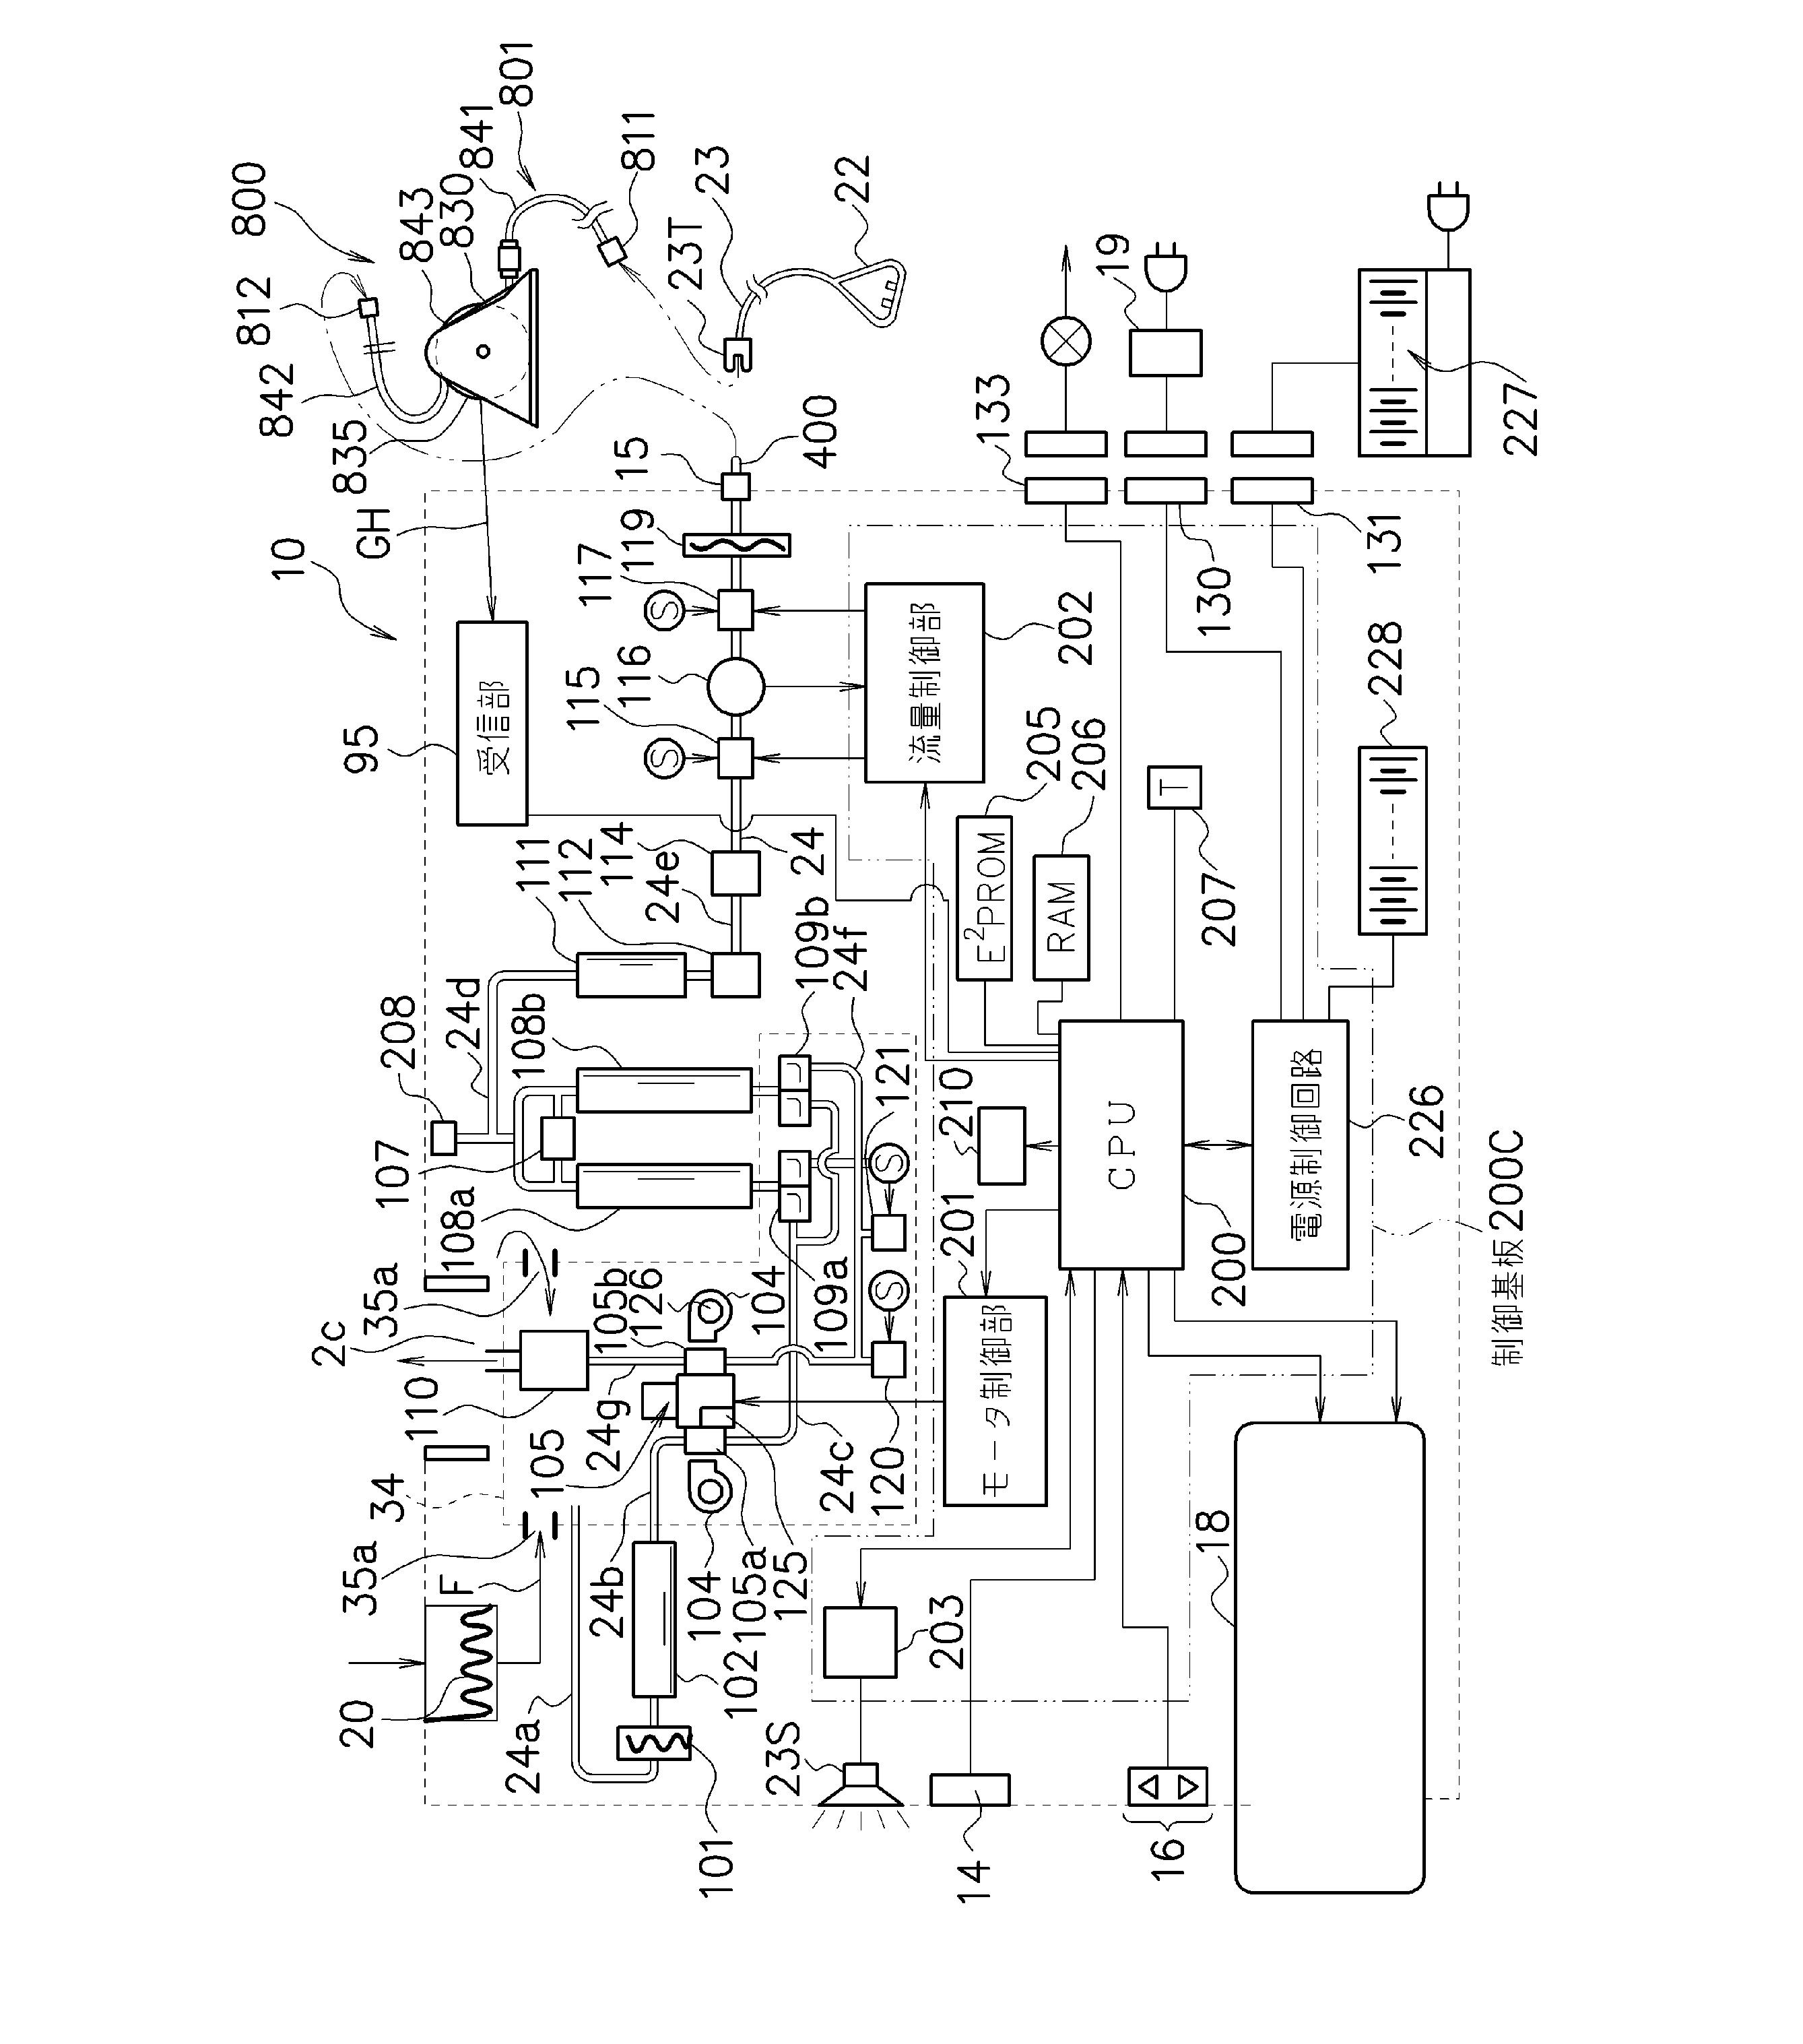 WO2014083594A1 - 延長チューブ巻取器および酸素濃縮装置         - Google PatentsFamily